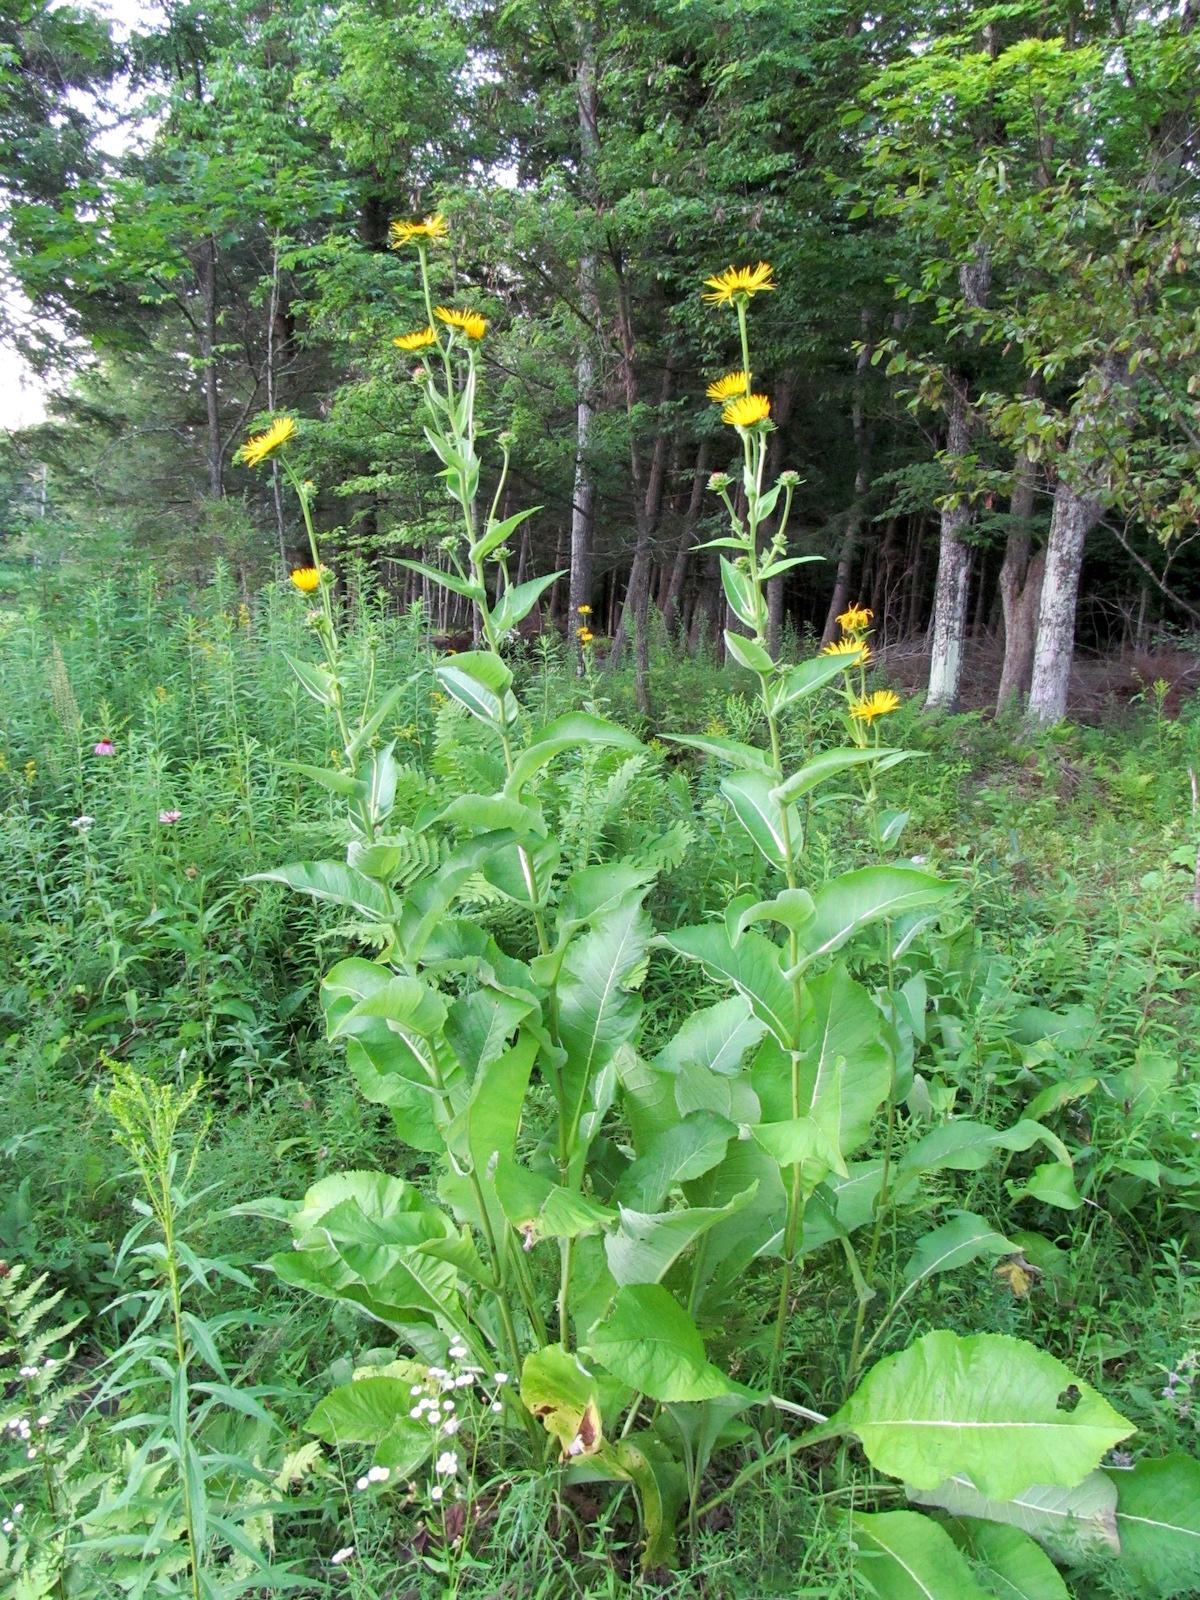 Elecampane plant in Bloom